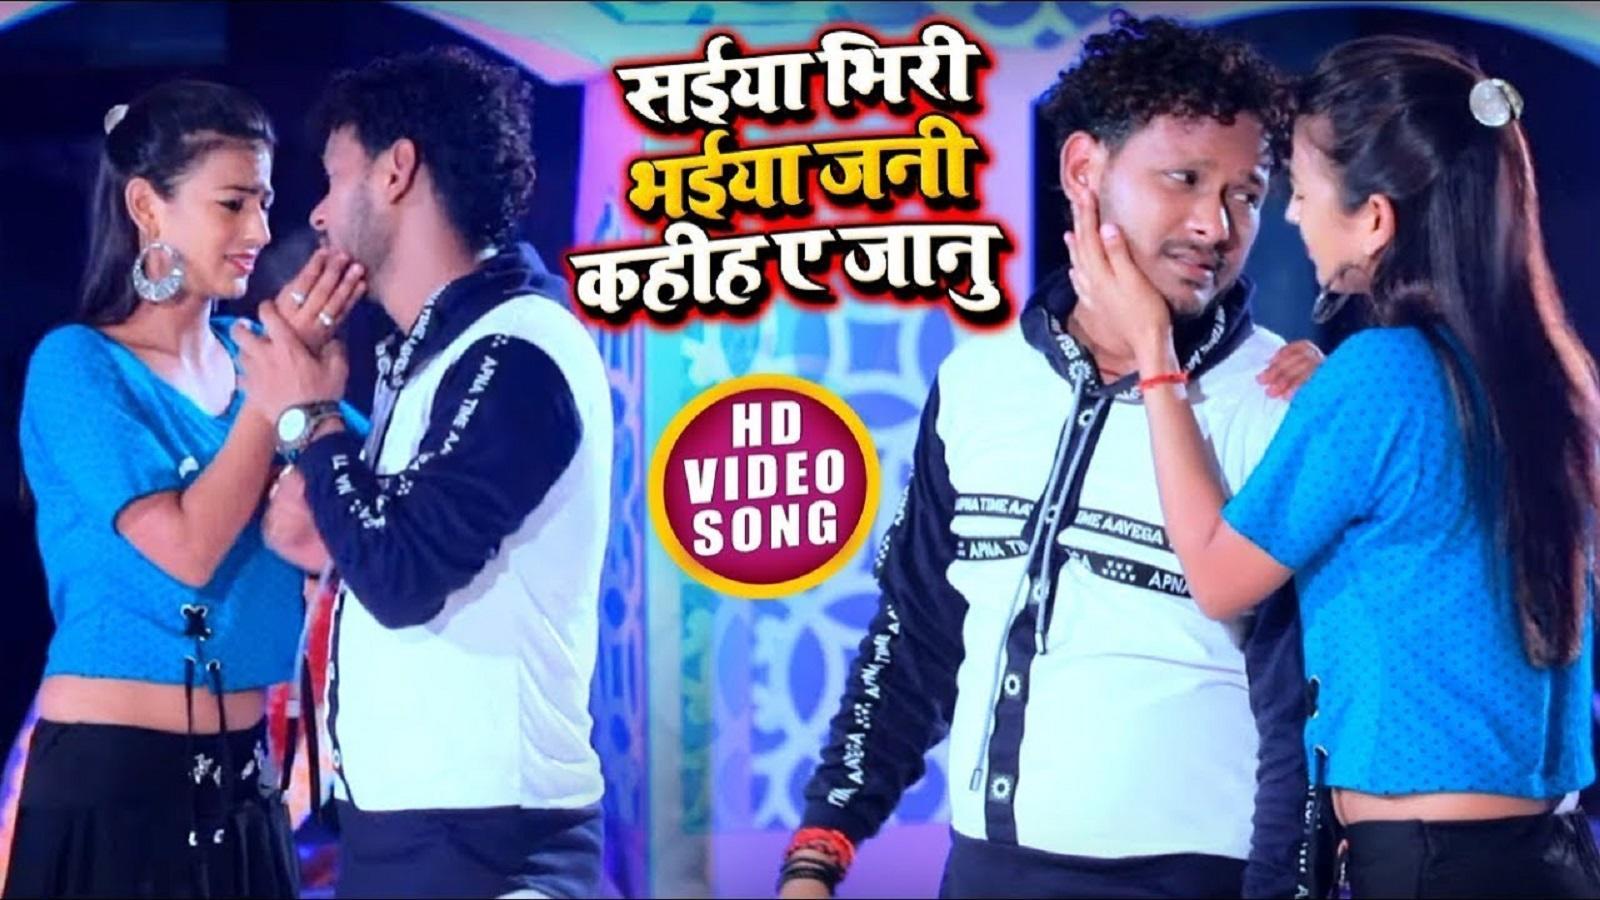 New Bhojpuri Song Video: Latest Bhojpuri Gana 'Saiya Bhiri